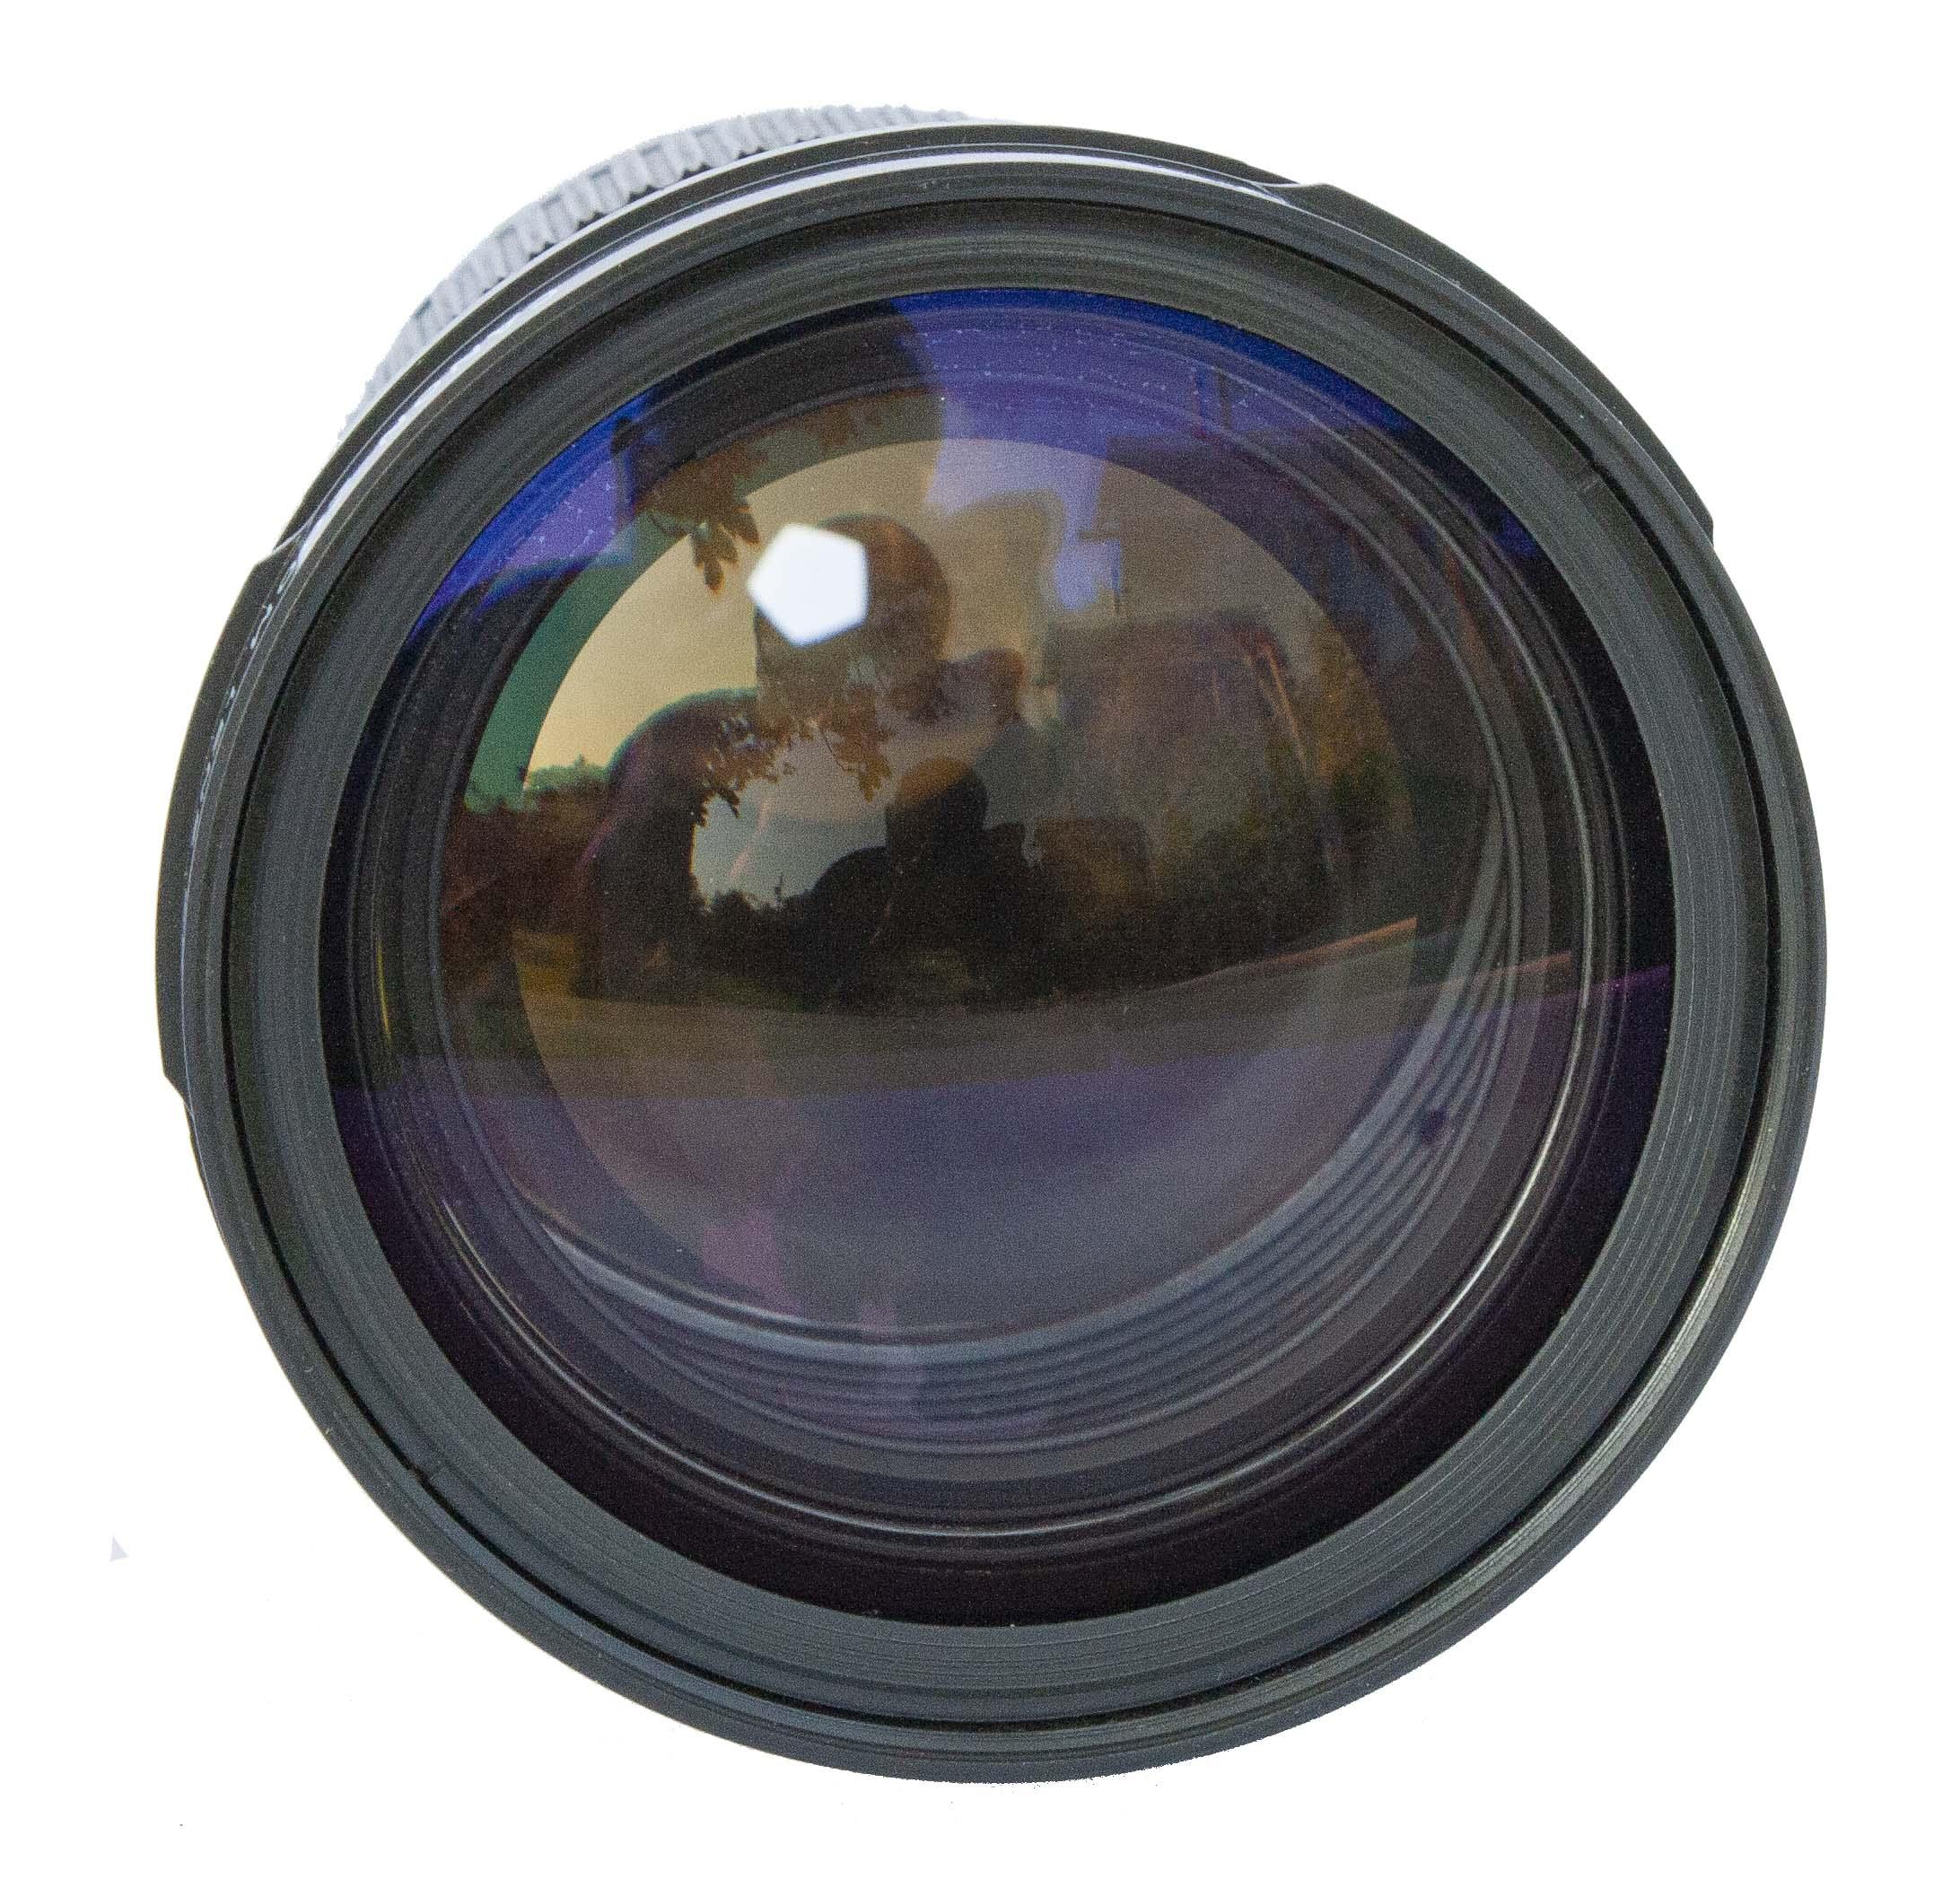 FDn 35-105mm f/3.5 Lens